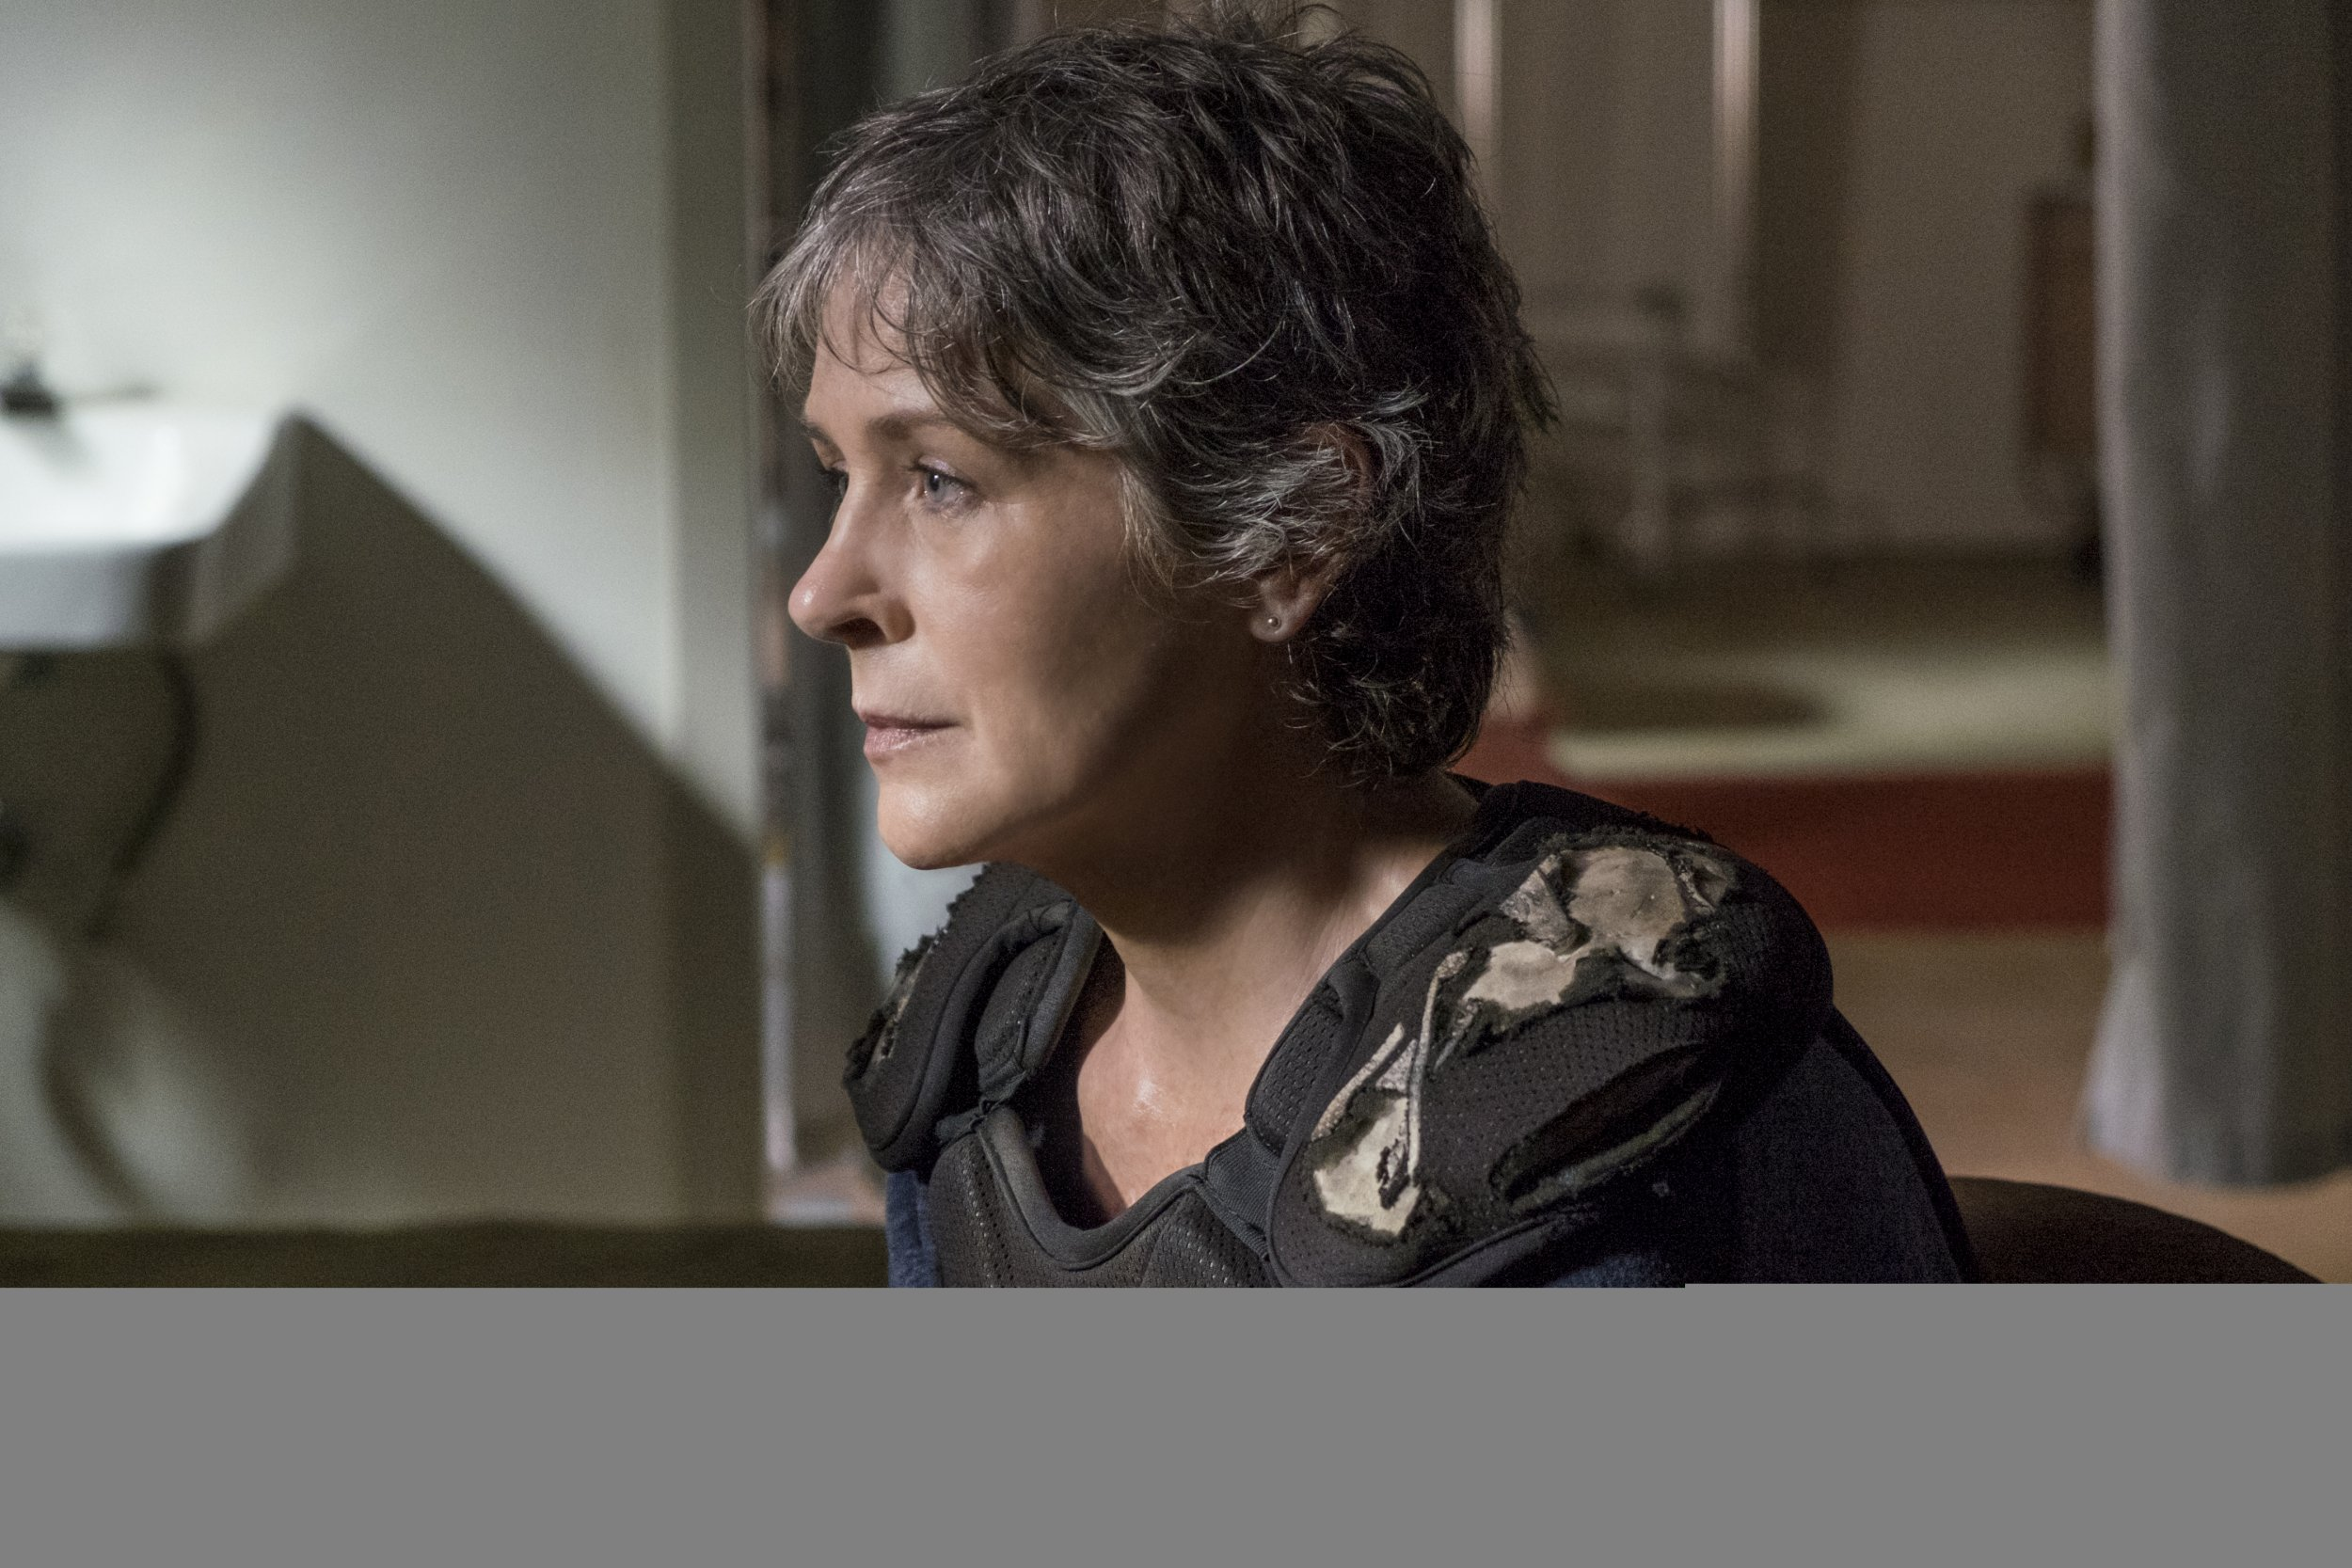 Spoilers reveal who dies in episode 13 of 'The Walking Dead'